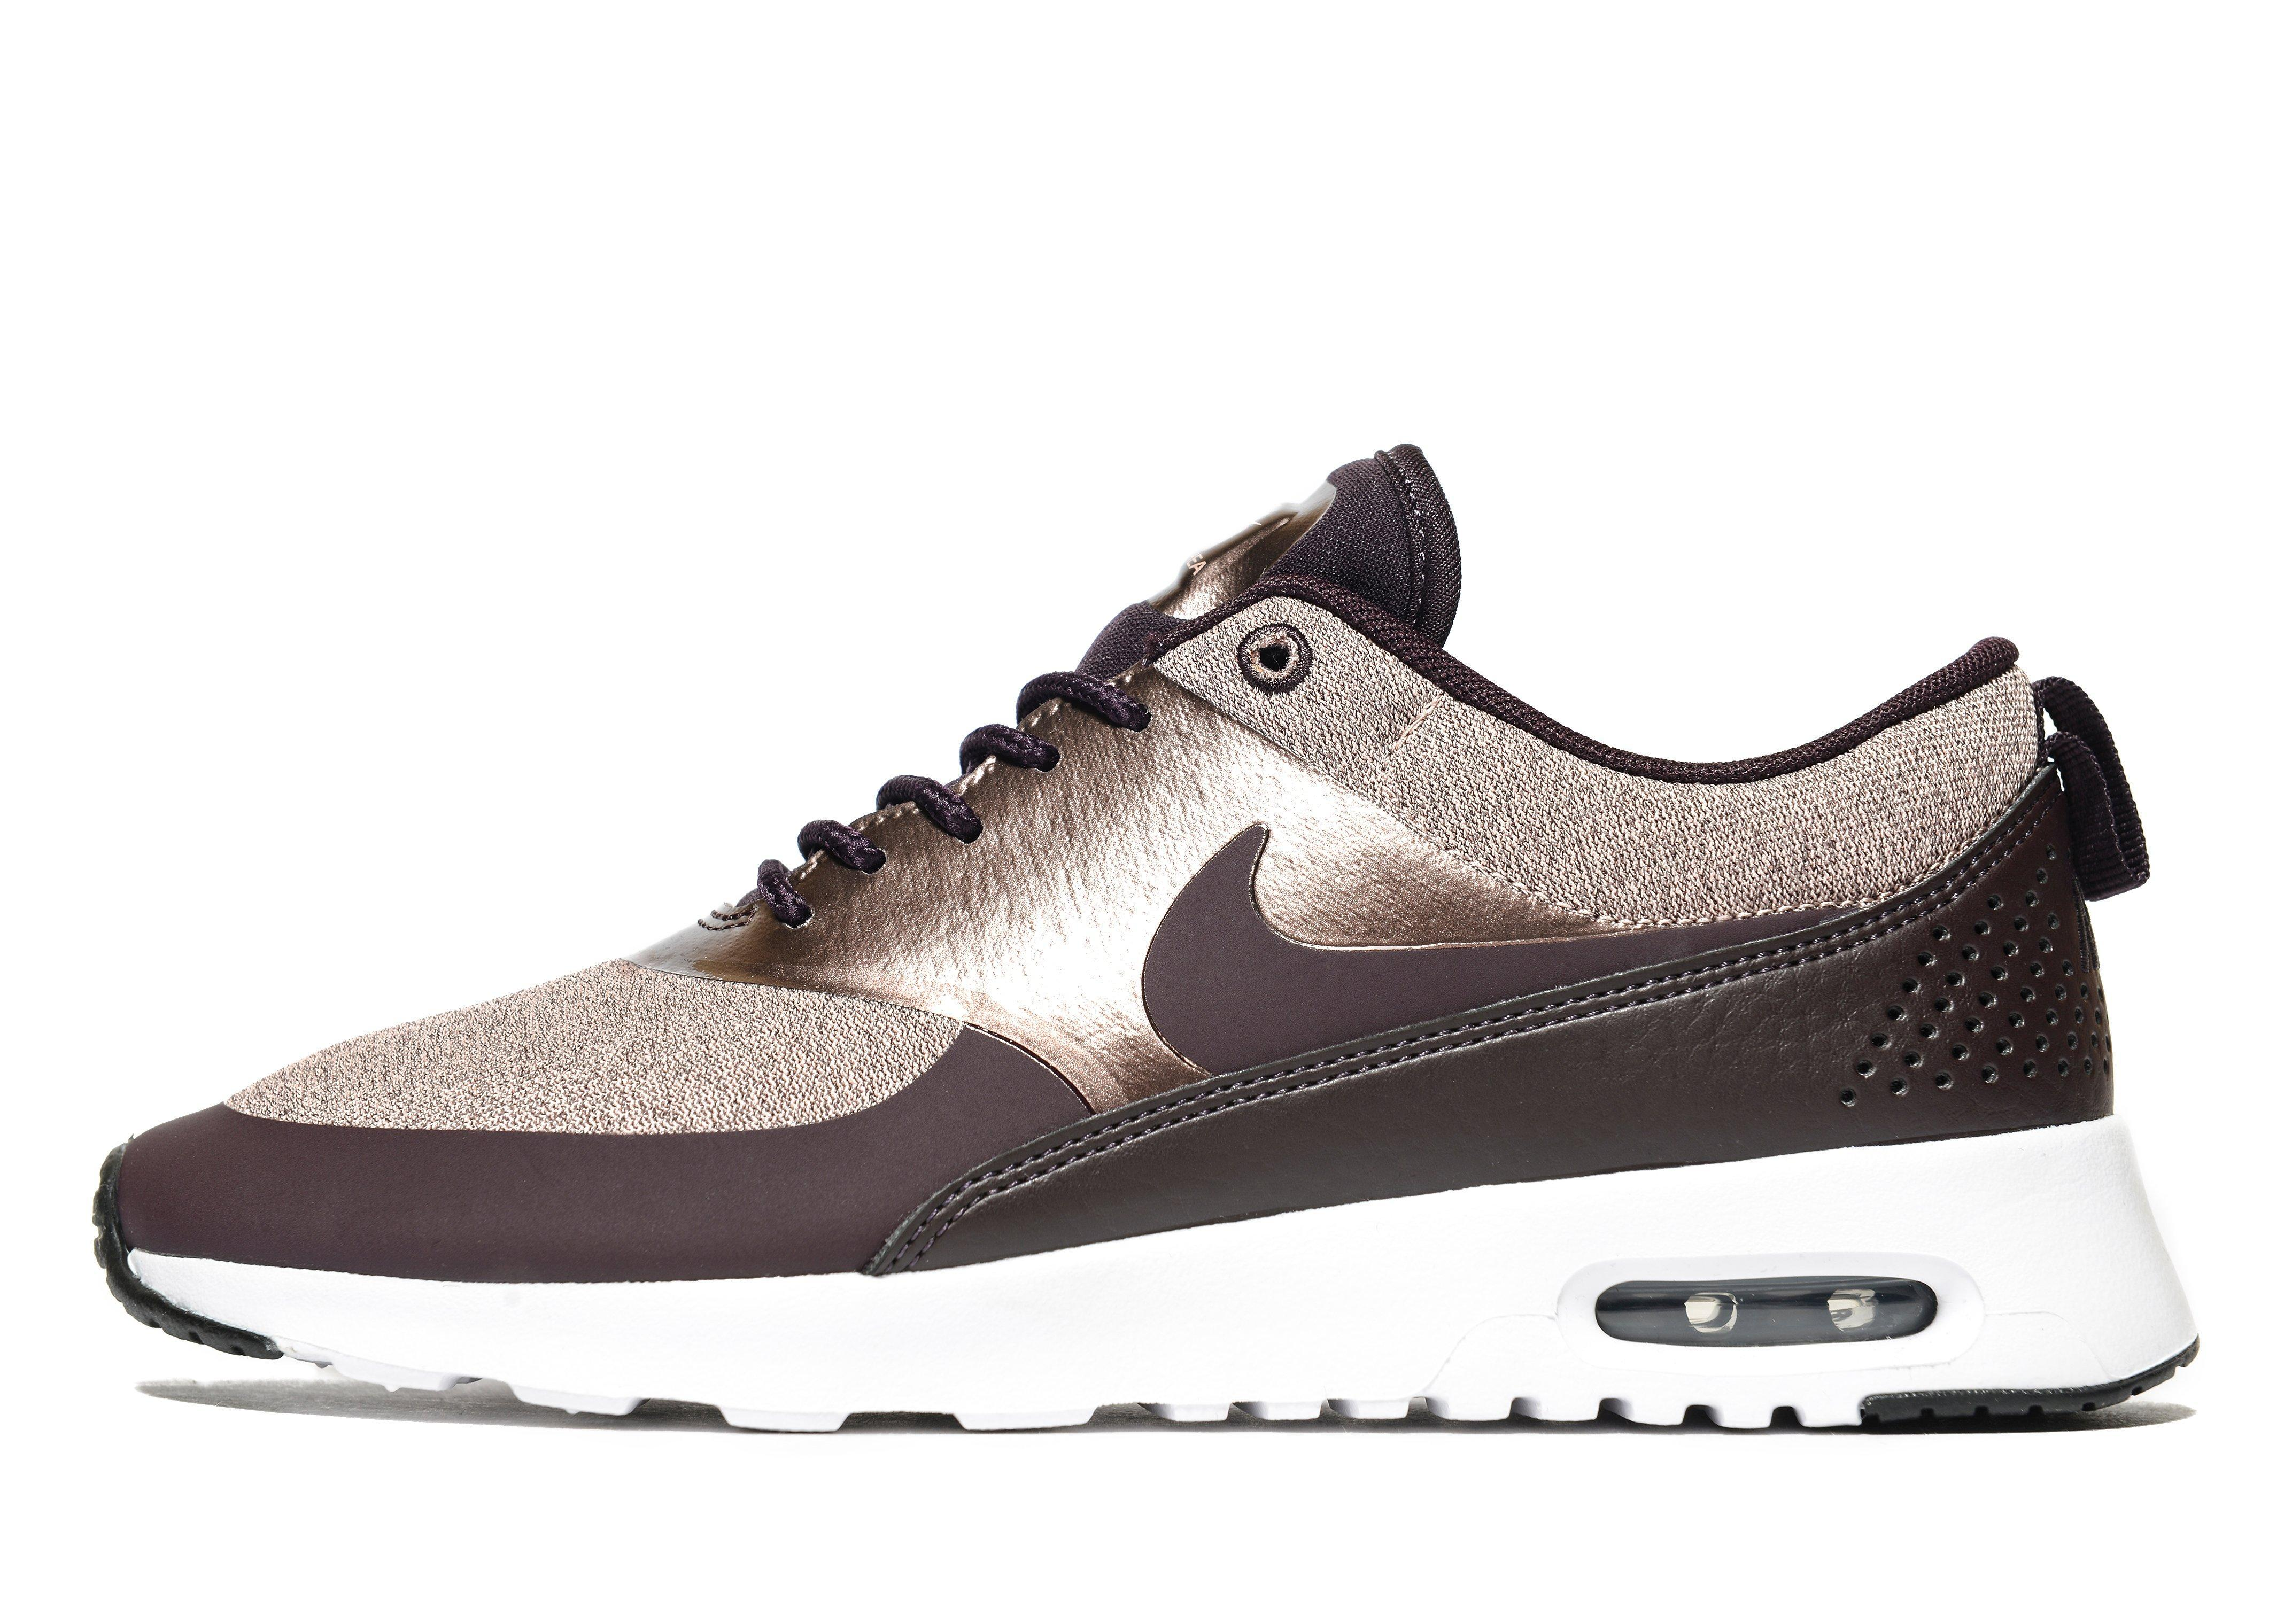 4bfa9f8de77f9 Nike Air Max Thea Knit in Black for Men - Lyst